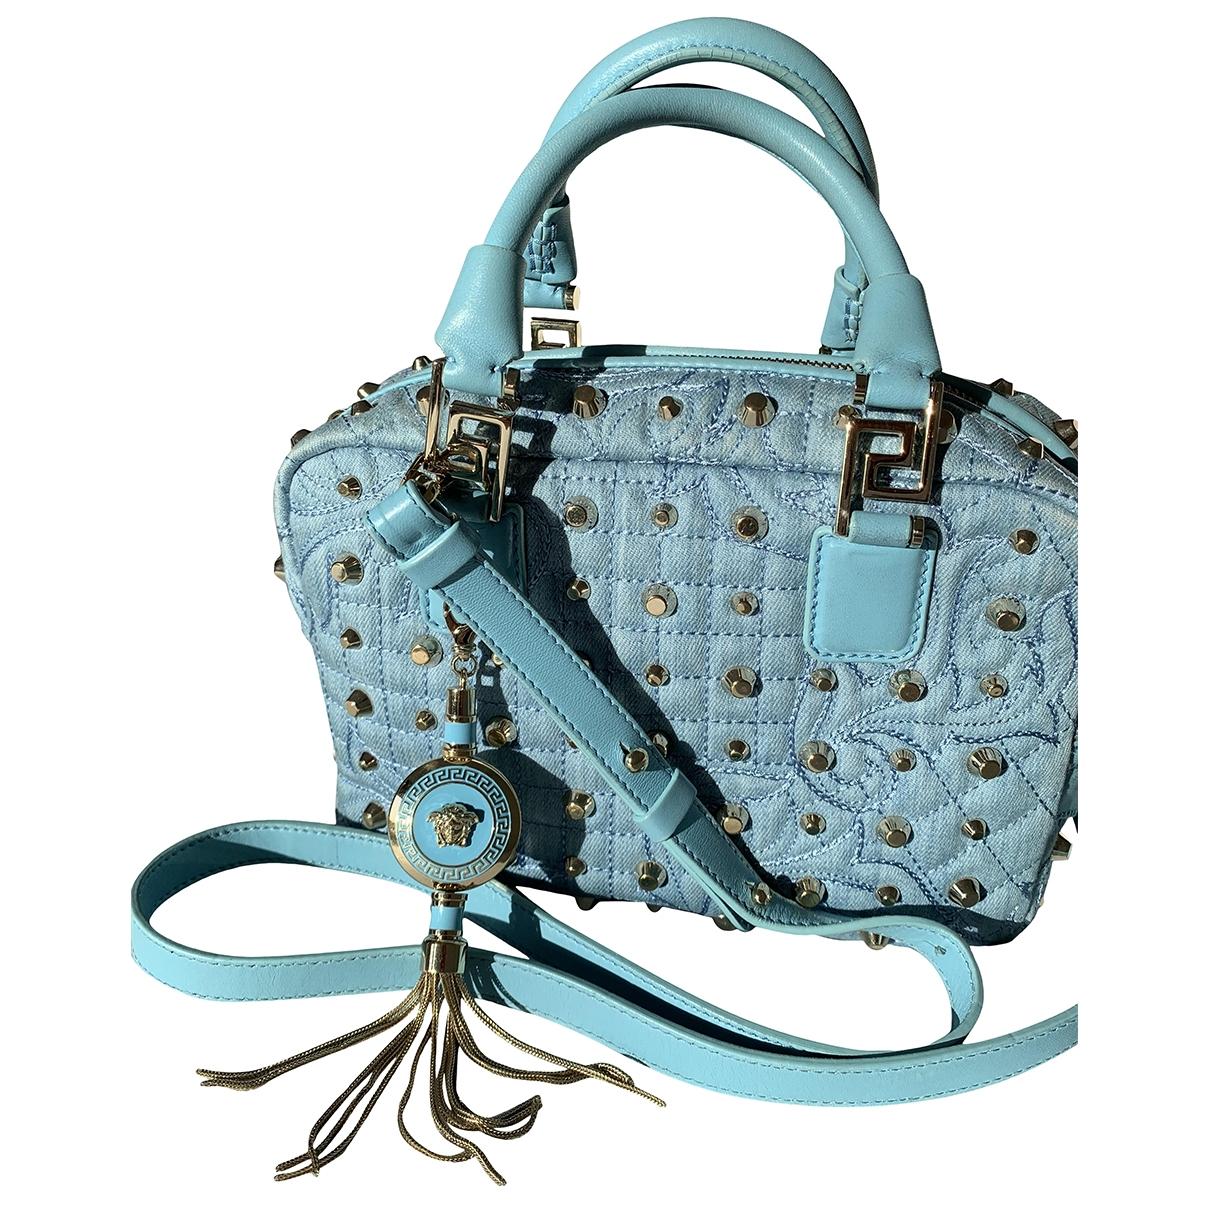 Versace \N Turquoise Leather handbag for Women \N